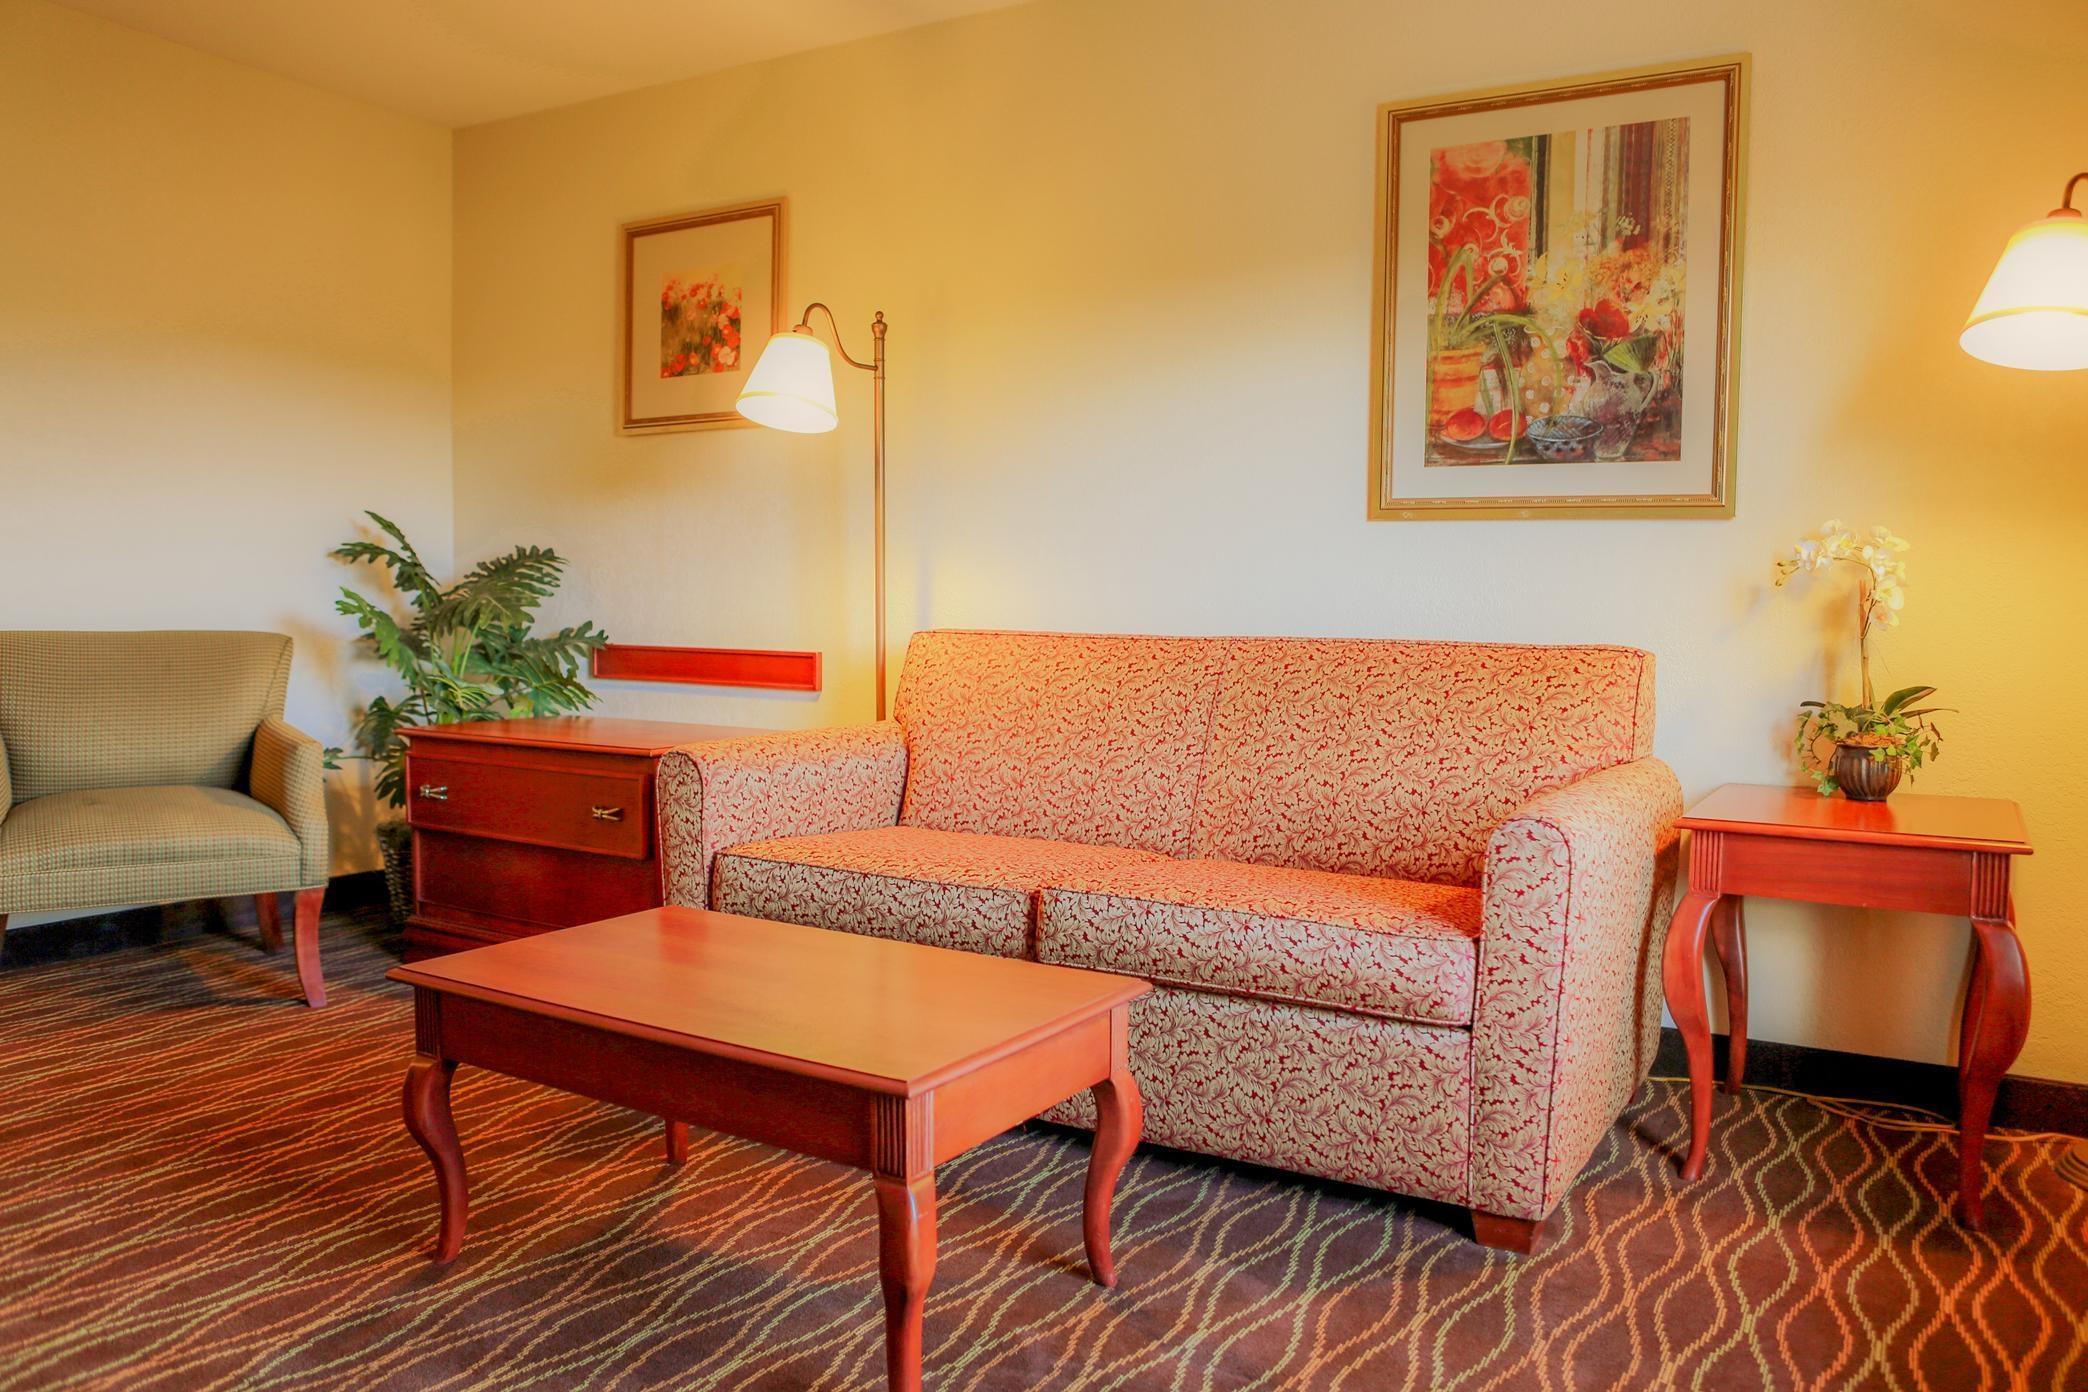 Hampton Inn & Suites Greenfield image 20